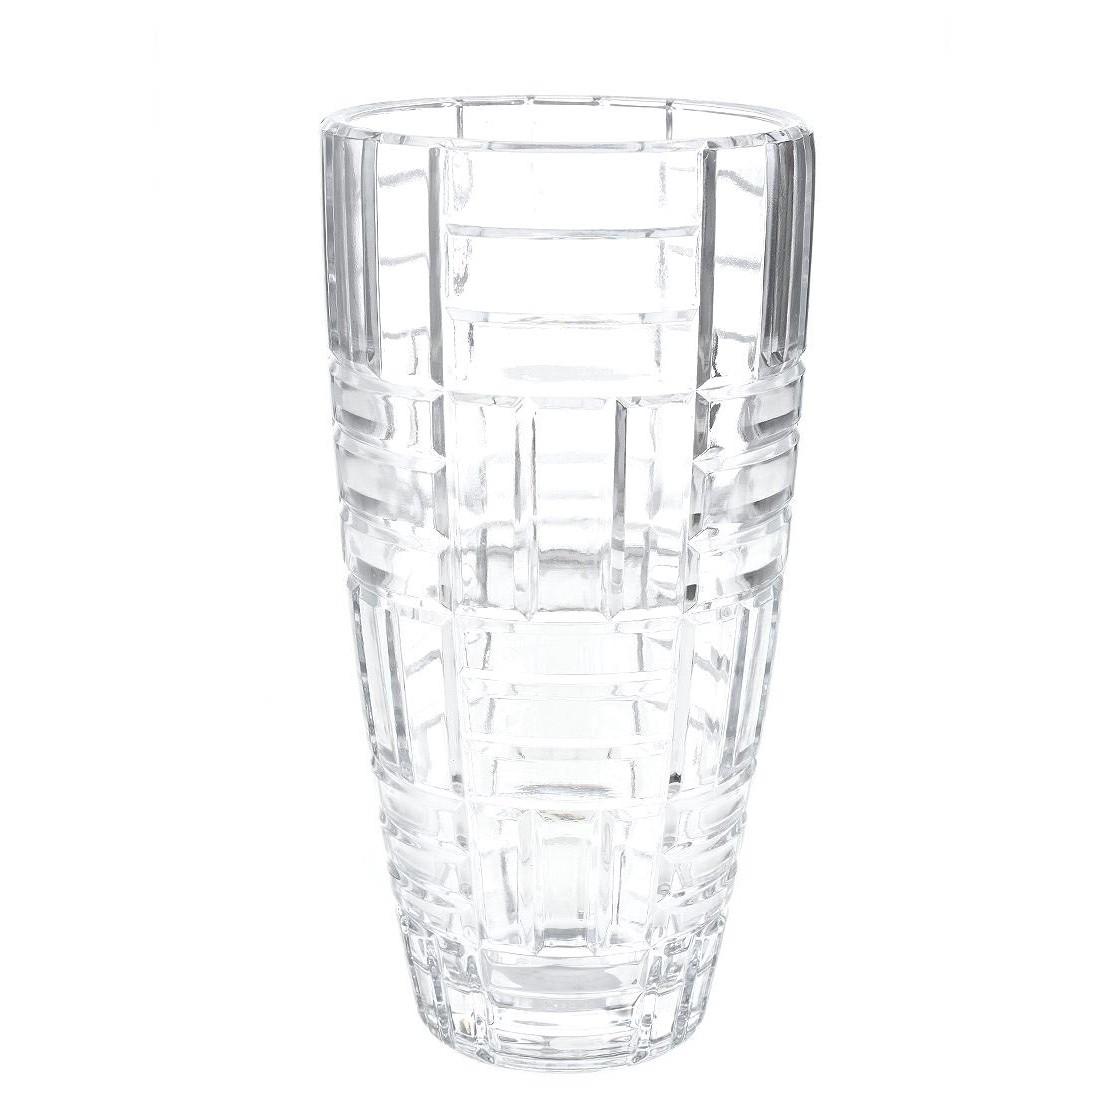 Vaso Decorativo de Vidro Luxo Listras Transparente - G Presentes